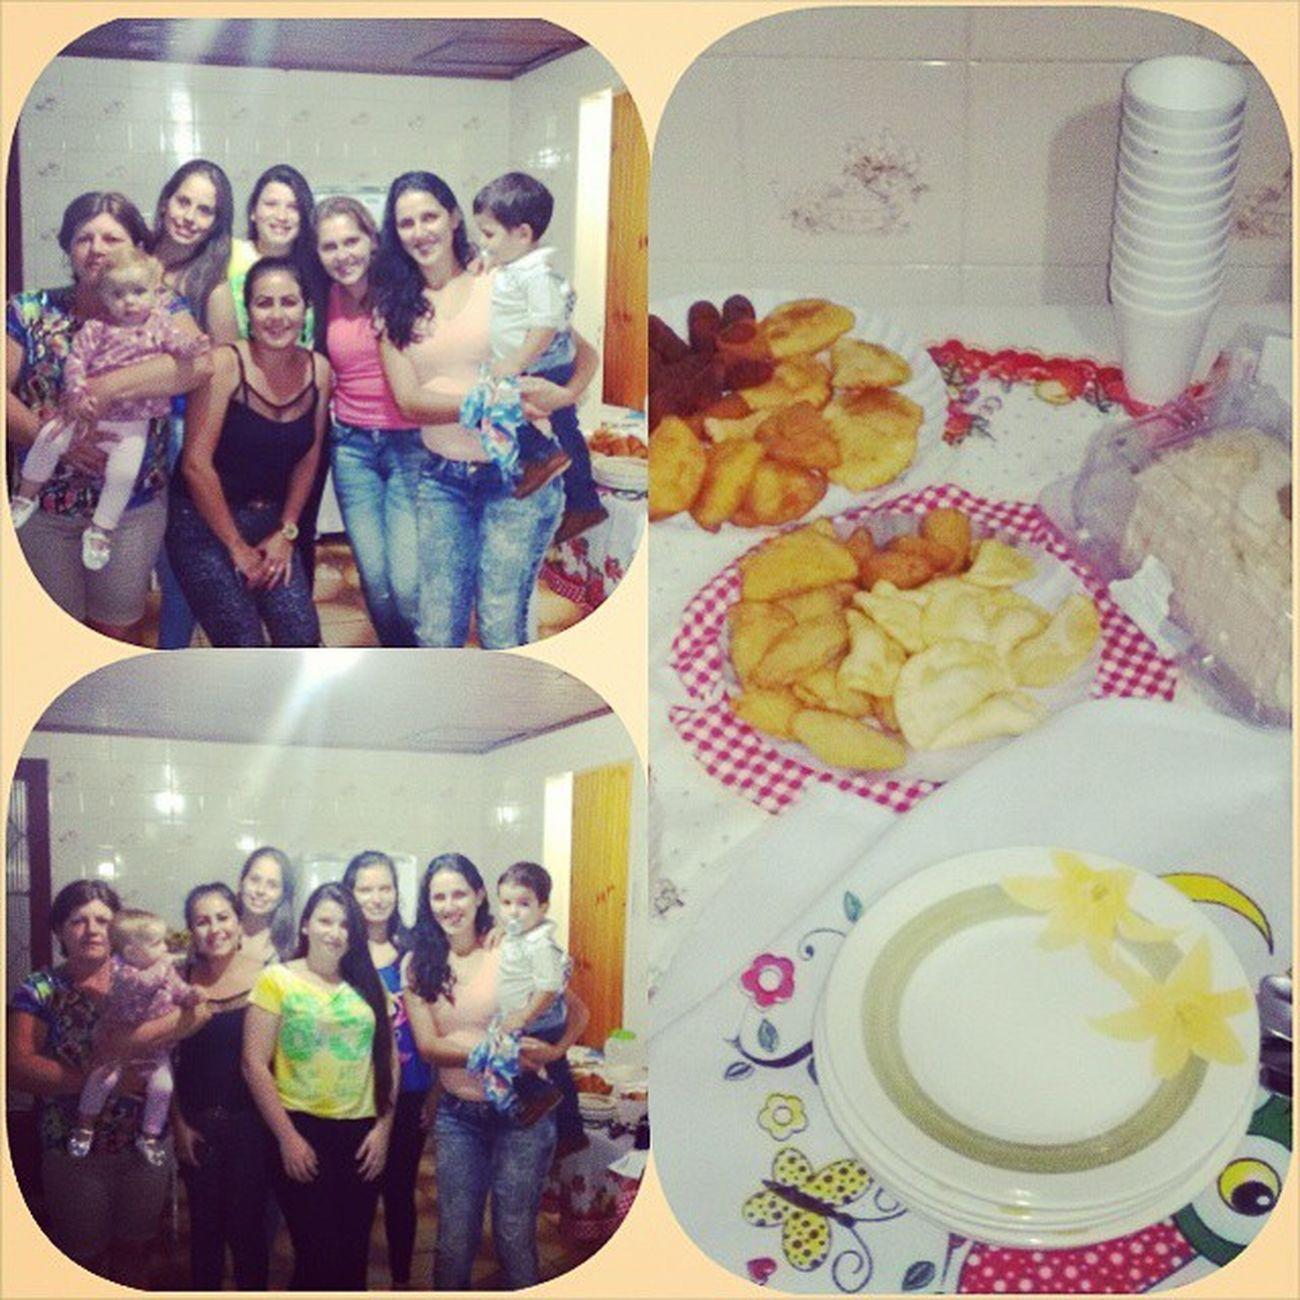 Deontem FestinhaSurpresa Pracunhada Tavamuitobom instahappy instafamily 💞👌